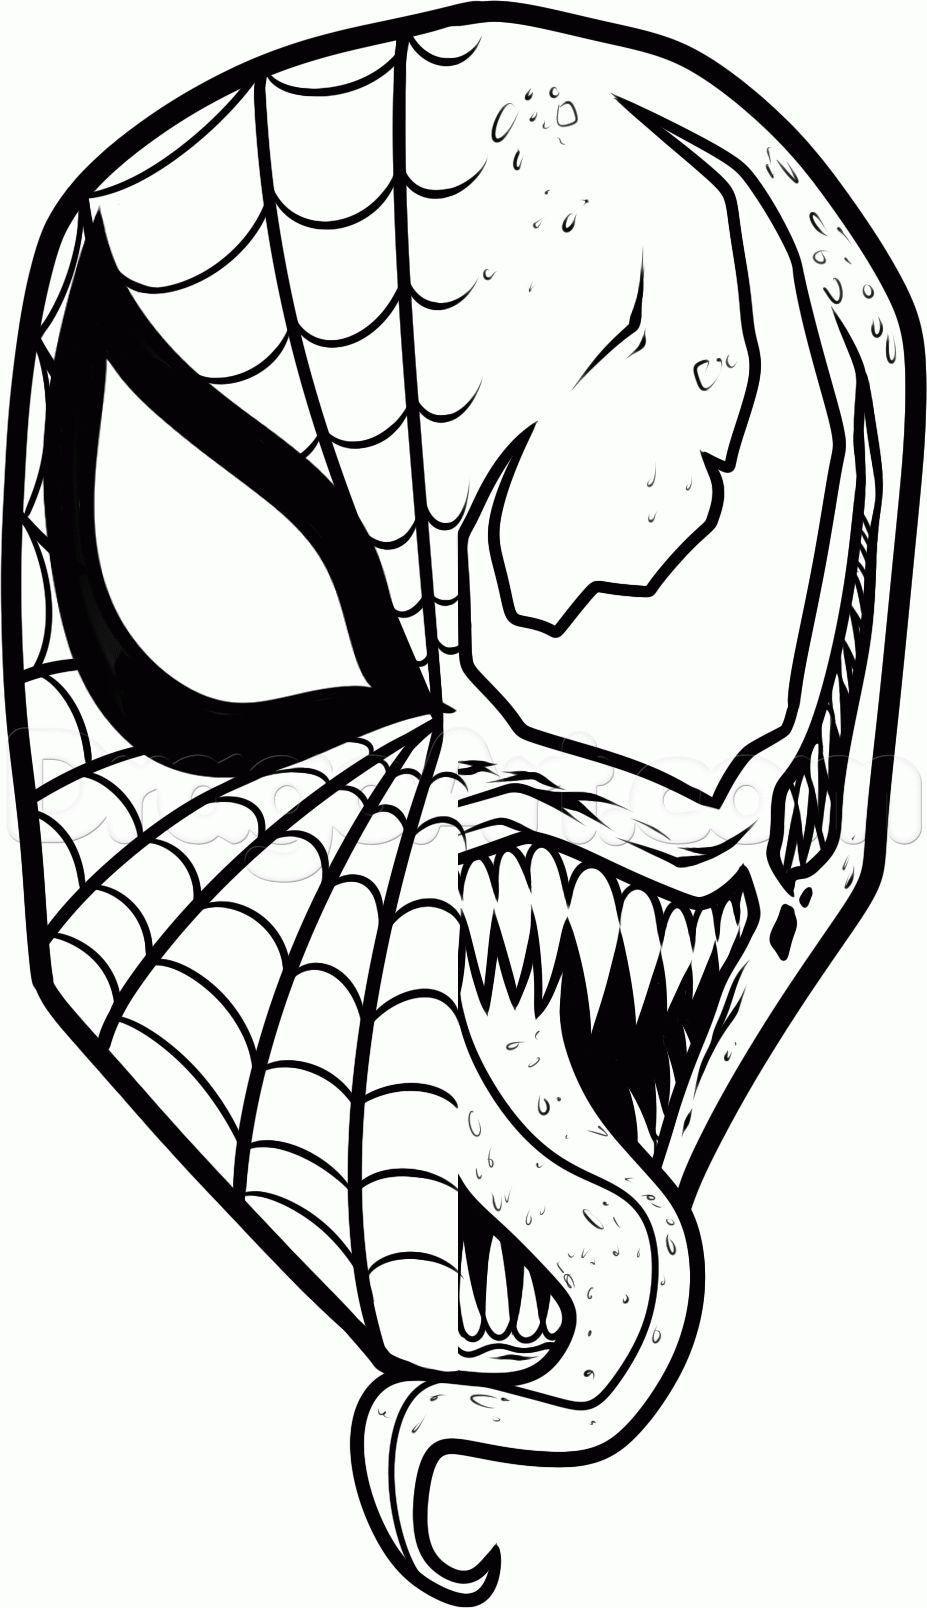 Idea de Jose smiith en Dibujos en 2020 Spiderman dibujo